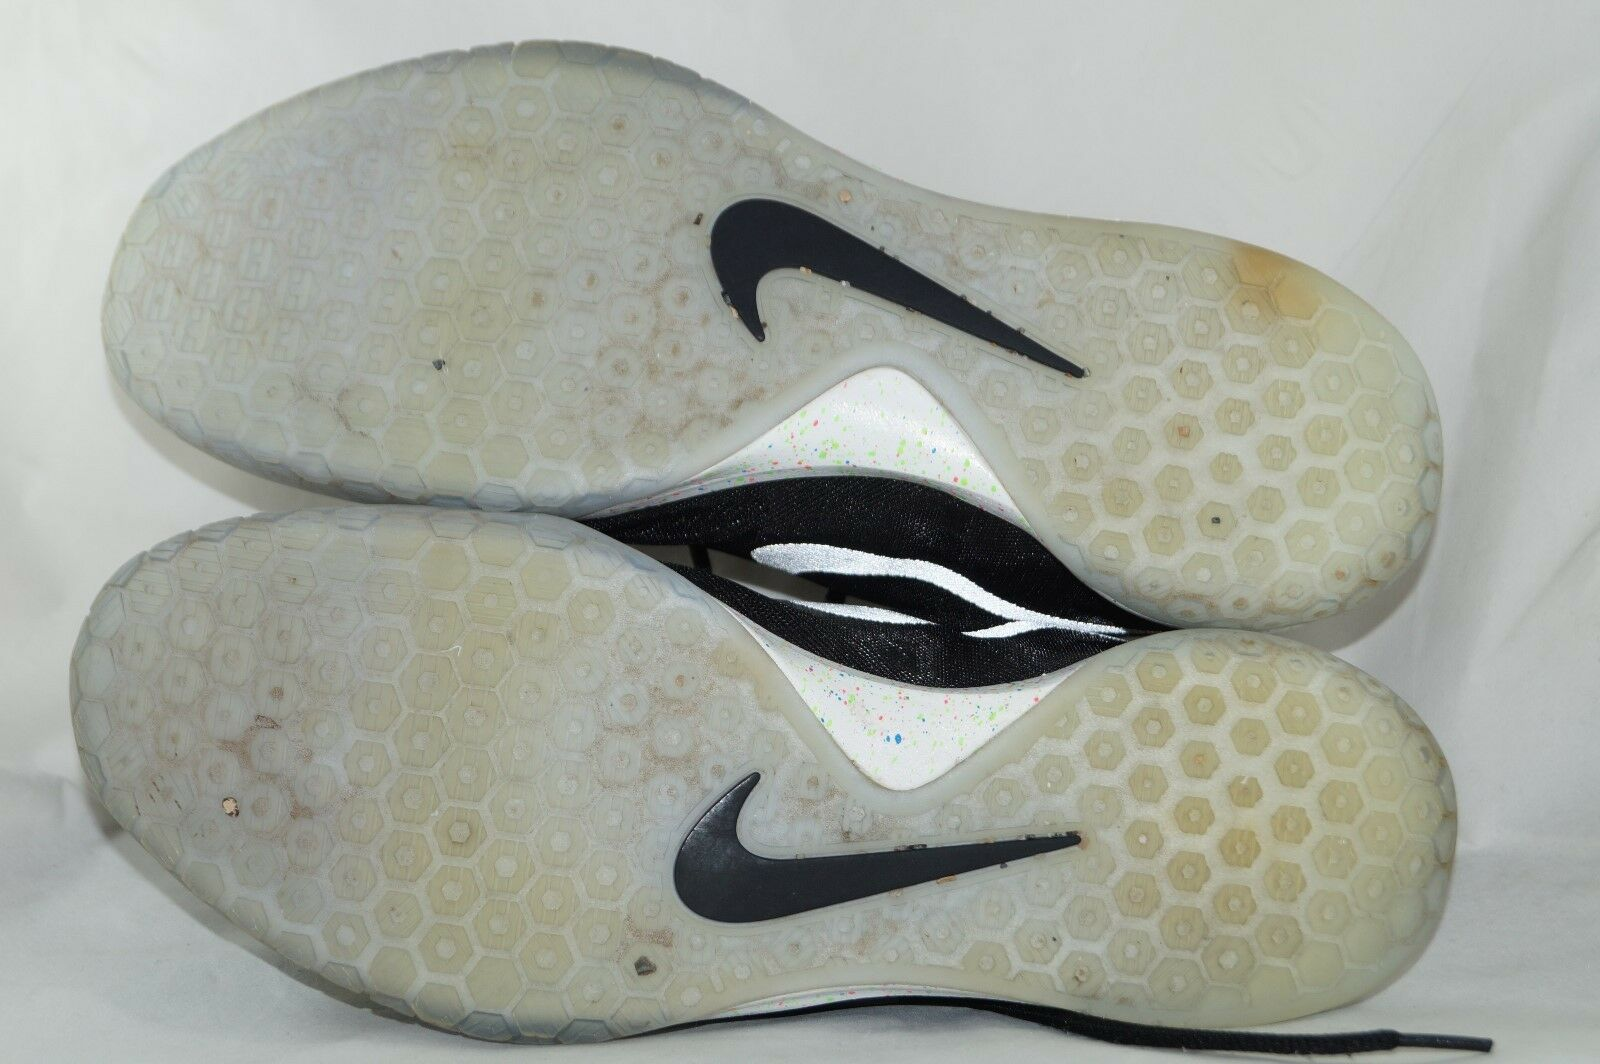 Nike Hyperchase  PRM Premium Gr: 47,5 - 46,5  Hyperchase Basketball Low Tops 88532a